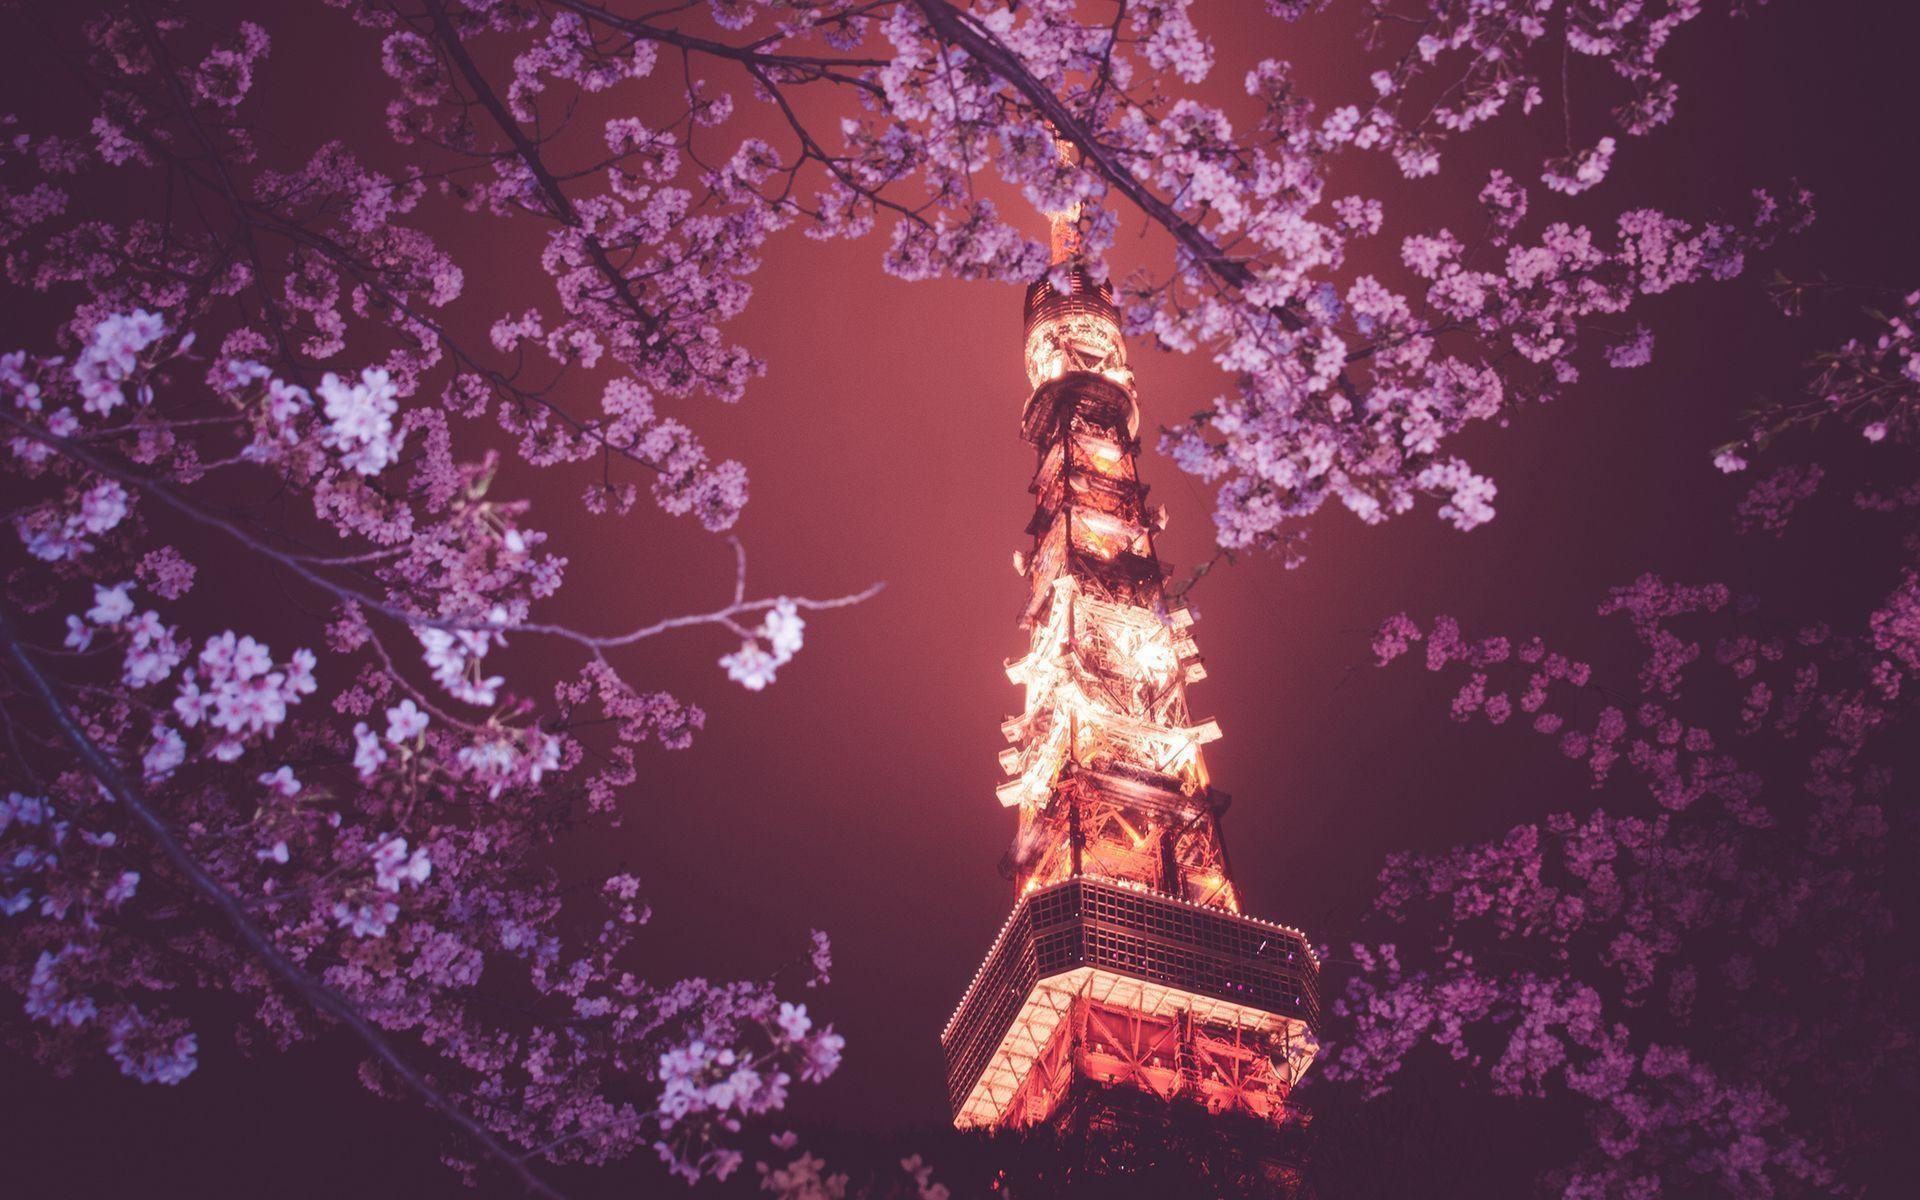 Tokyo Tower HD Wallpaper #20052) wallpaper - Wallatar.com